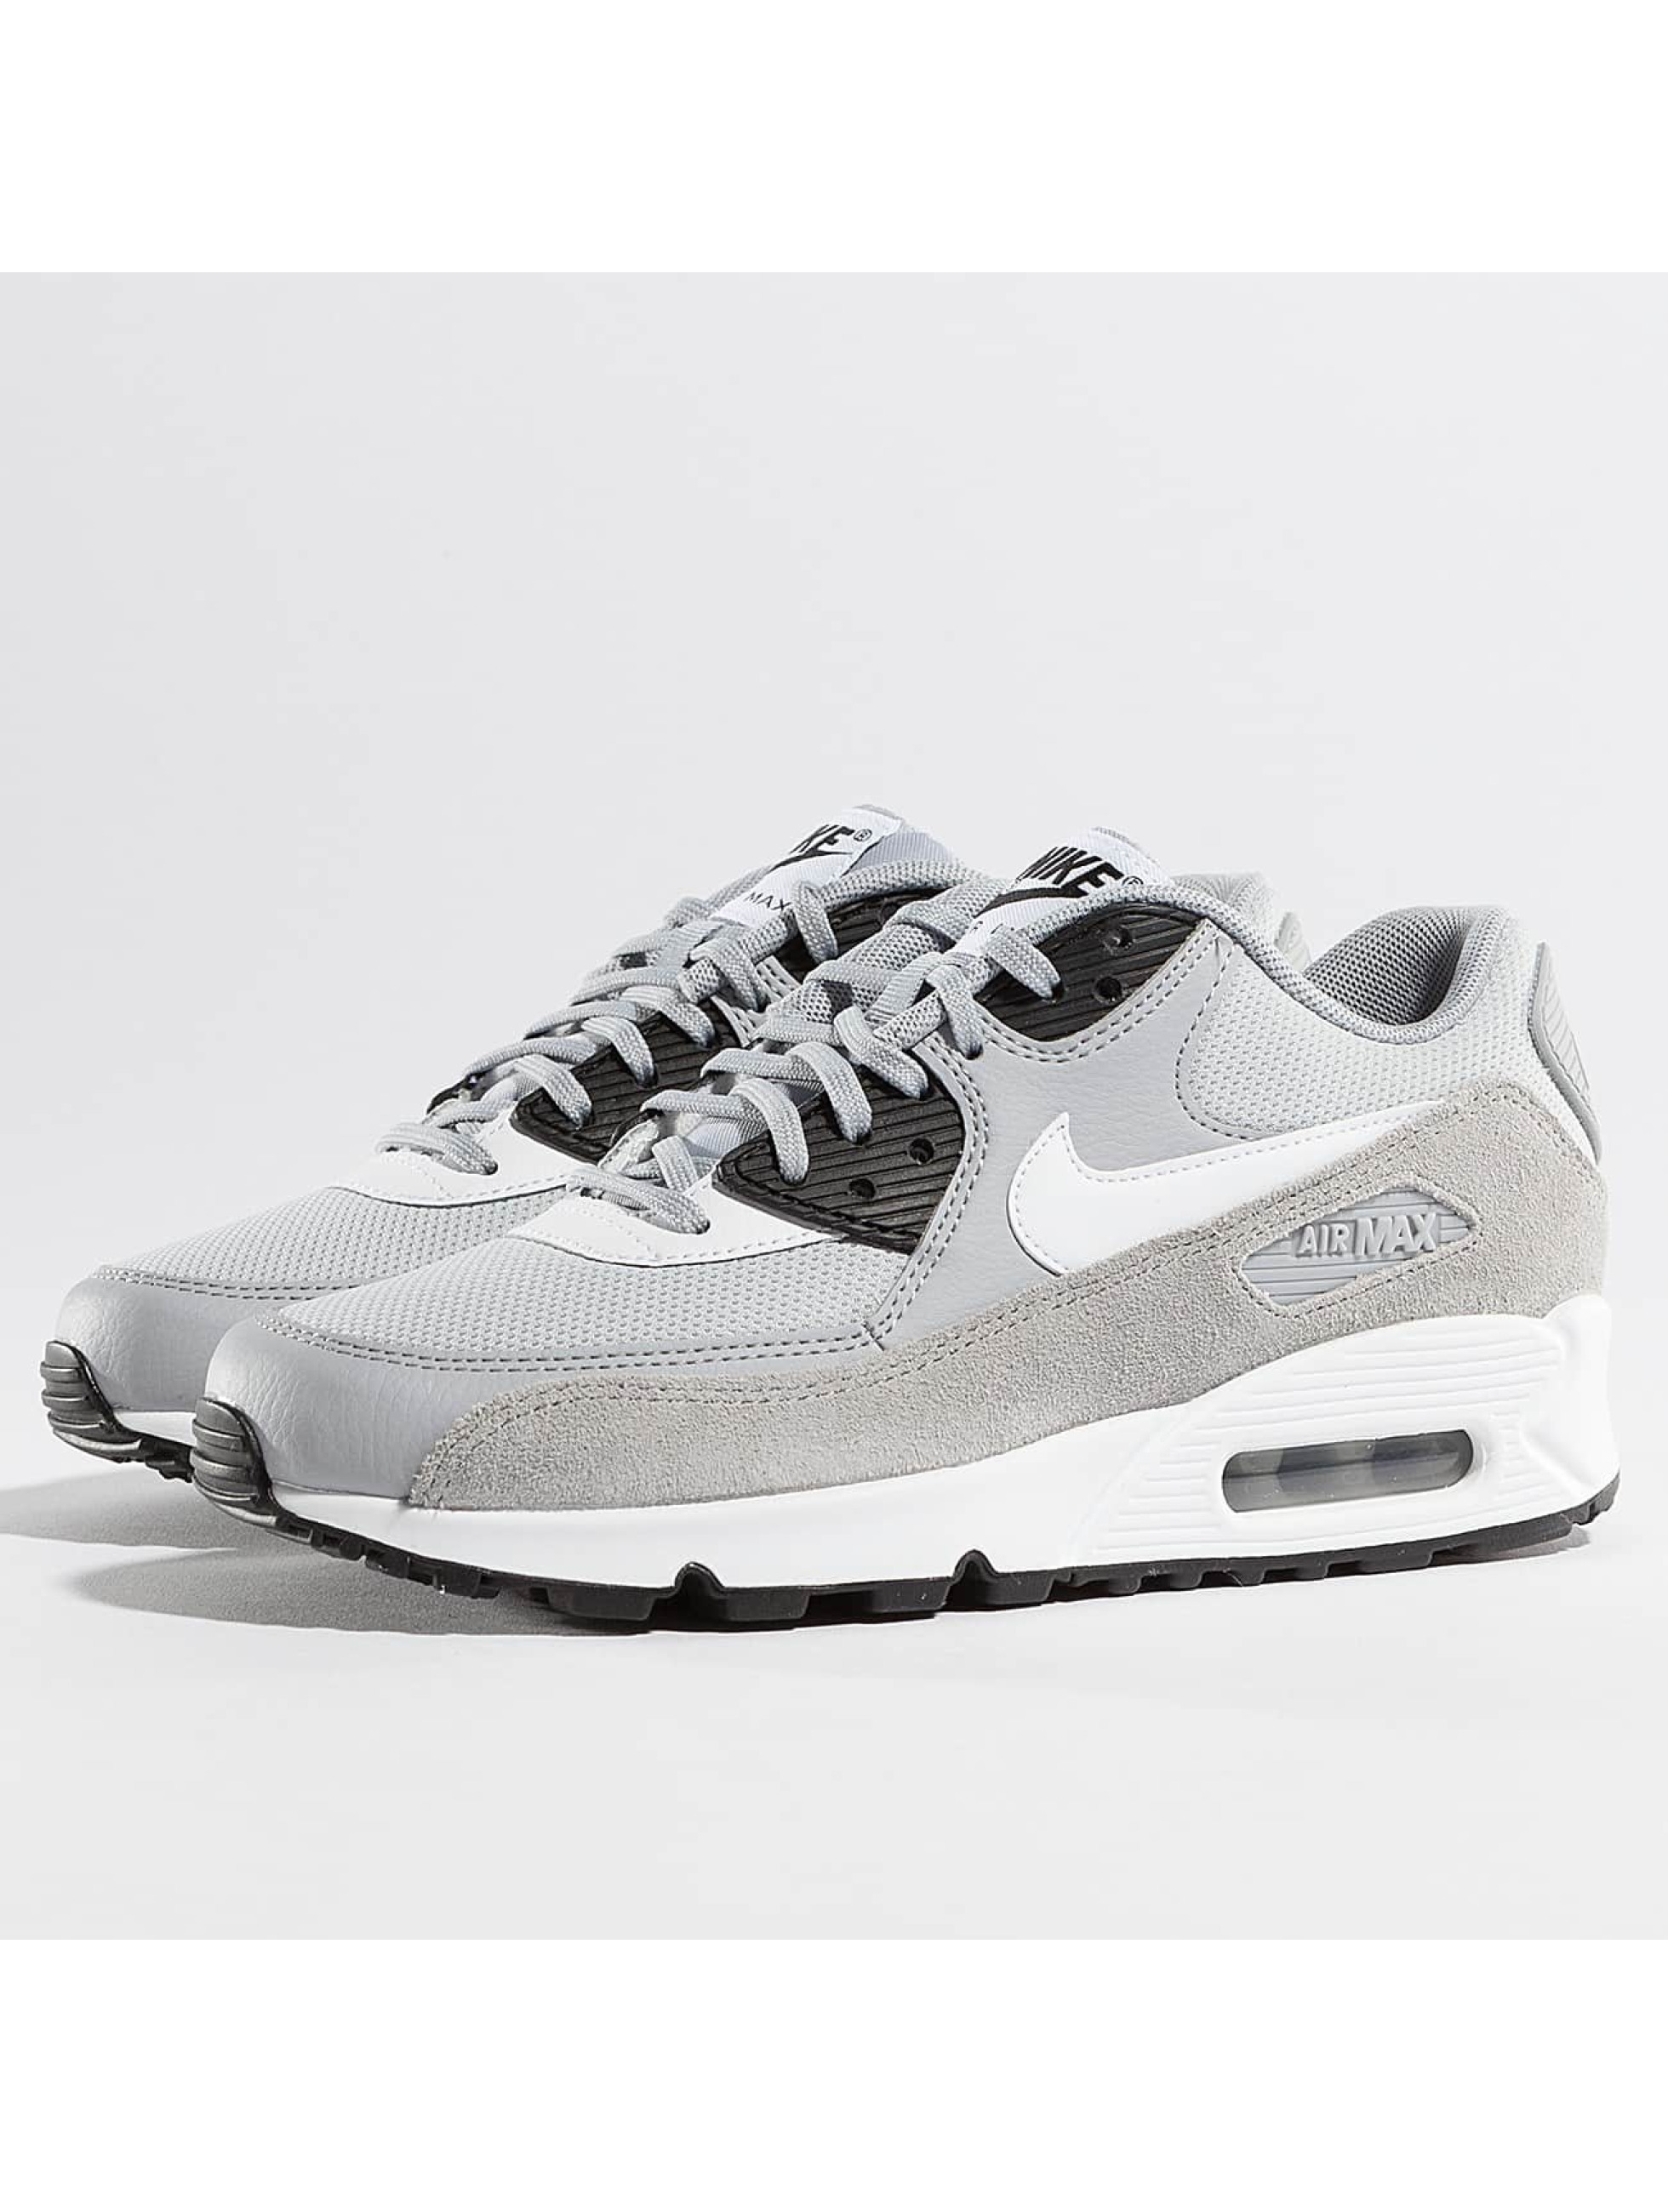 new arrival 3e2b4 1d912 Nike Damen Sneaker Air Max 90 in grau 306623